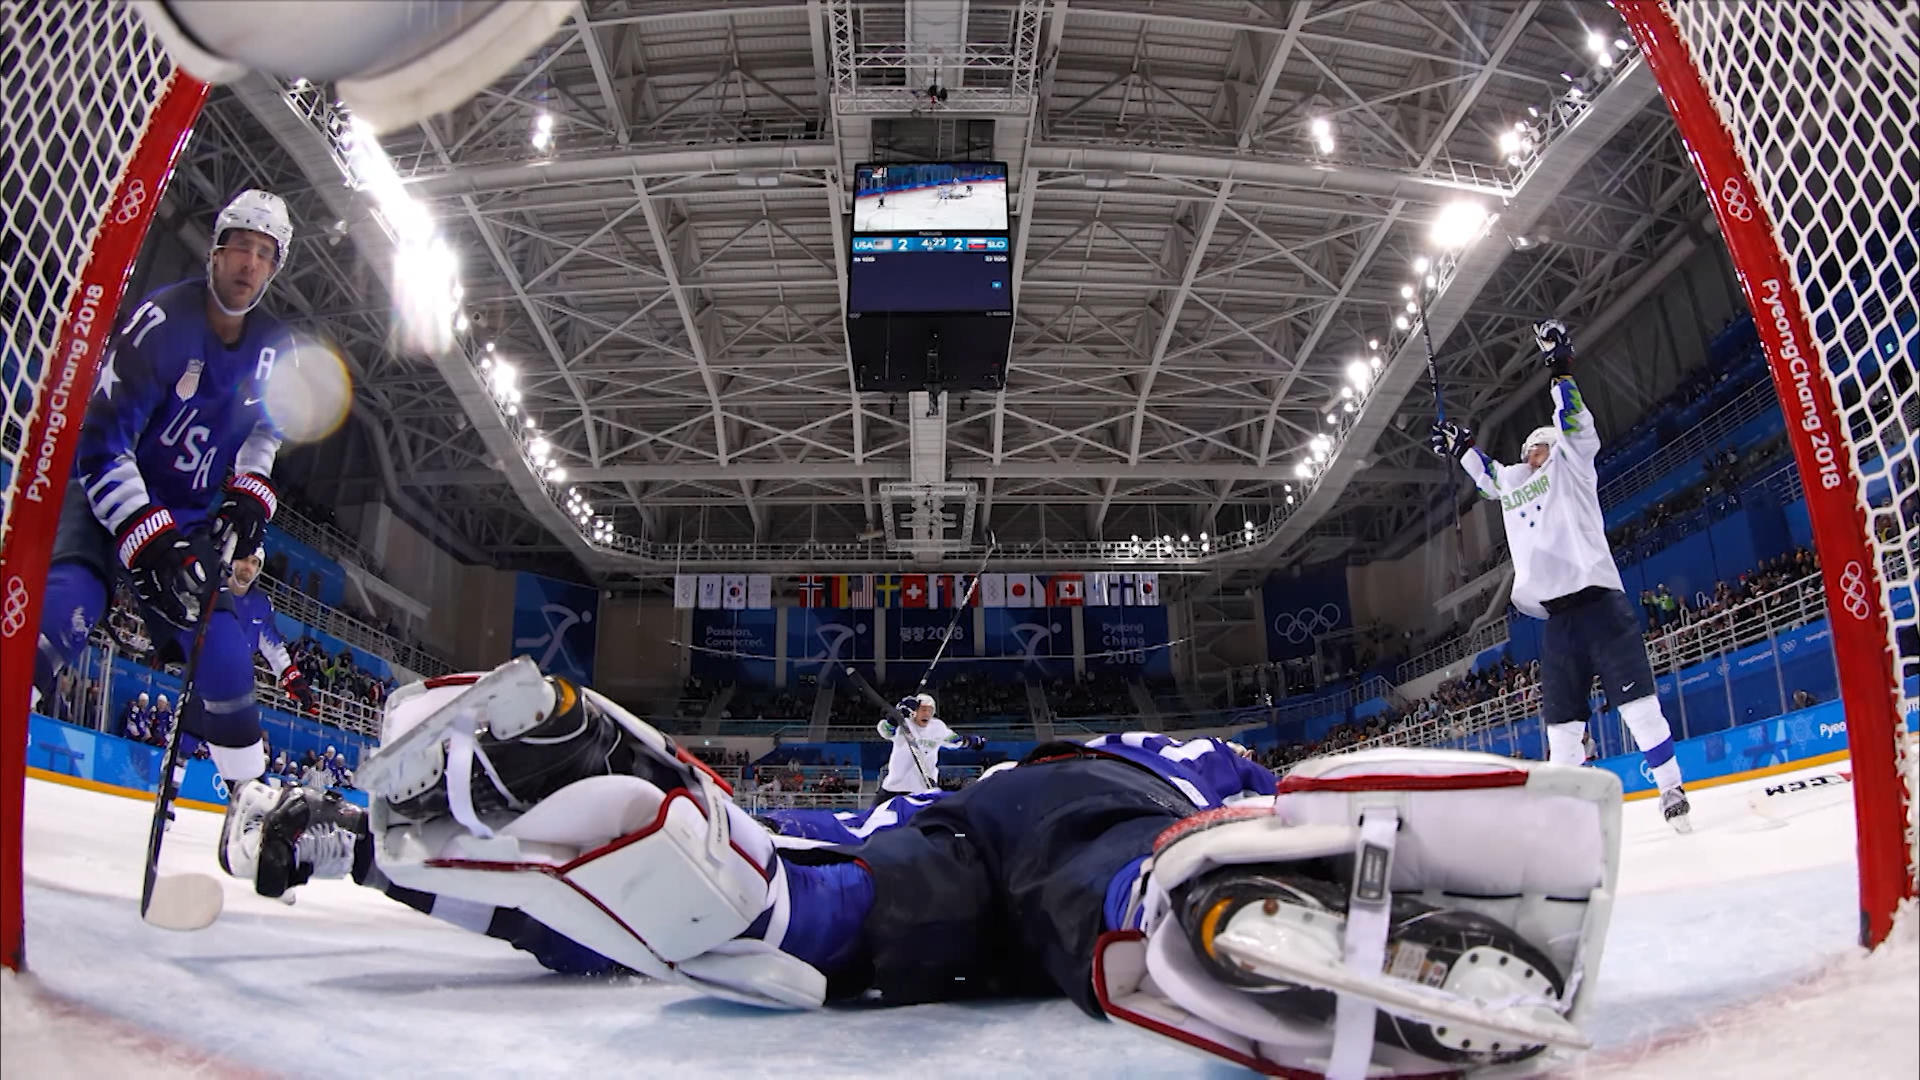 Winter Olympics highlights: Mikaela Shiffrin wins gold; Team USA hockey falls to Canada